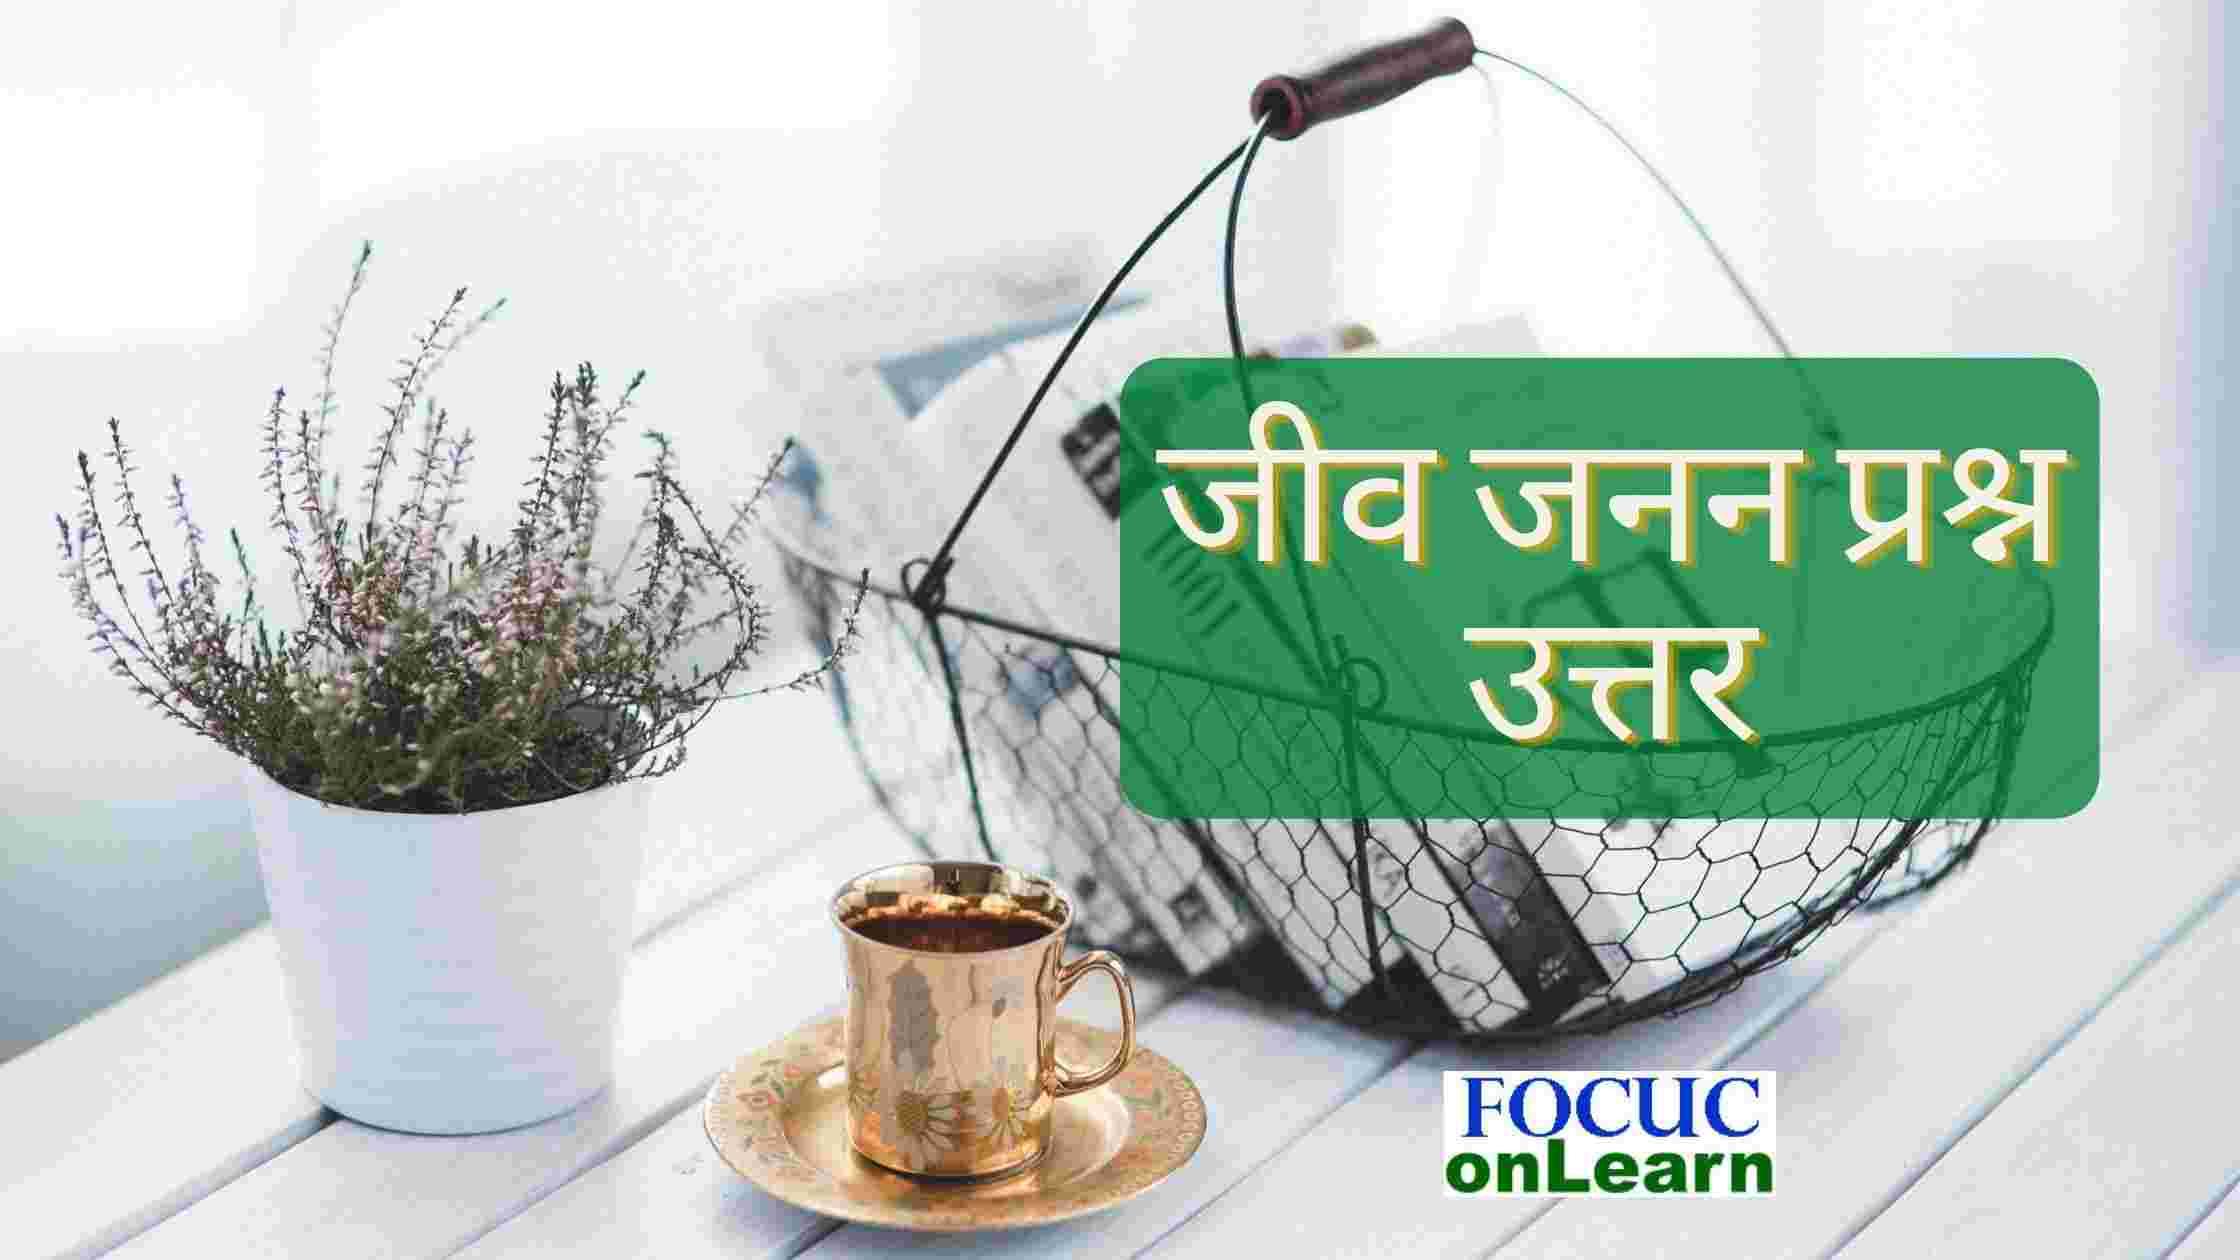 Jiw Janan Prashn Uttar